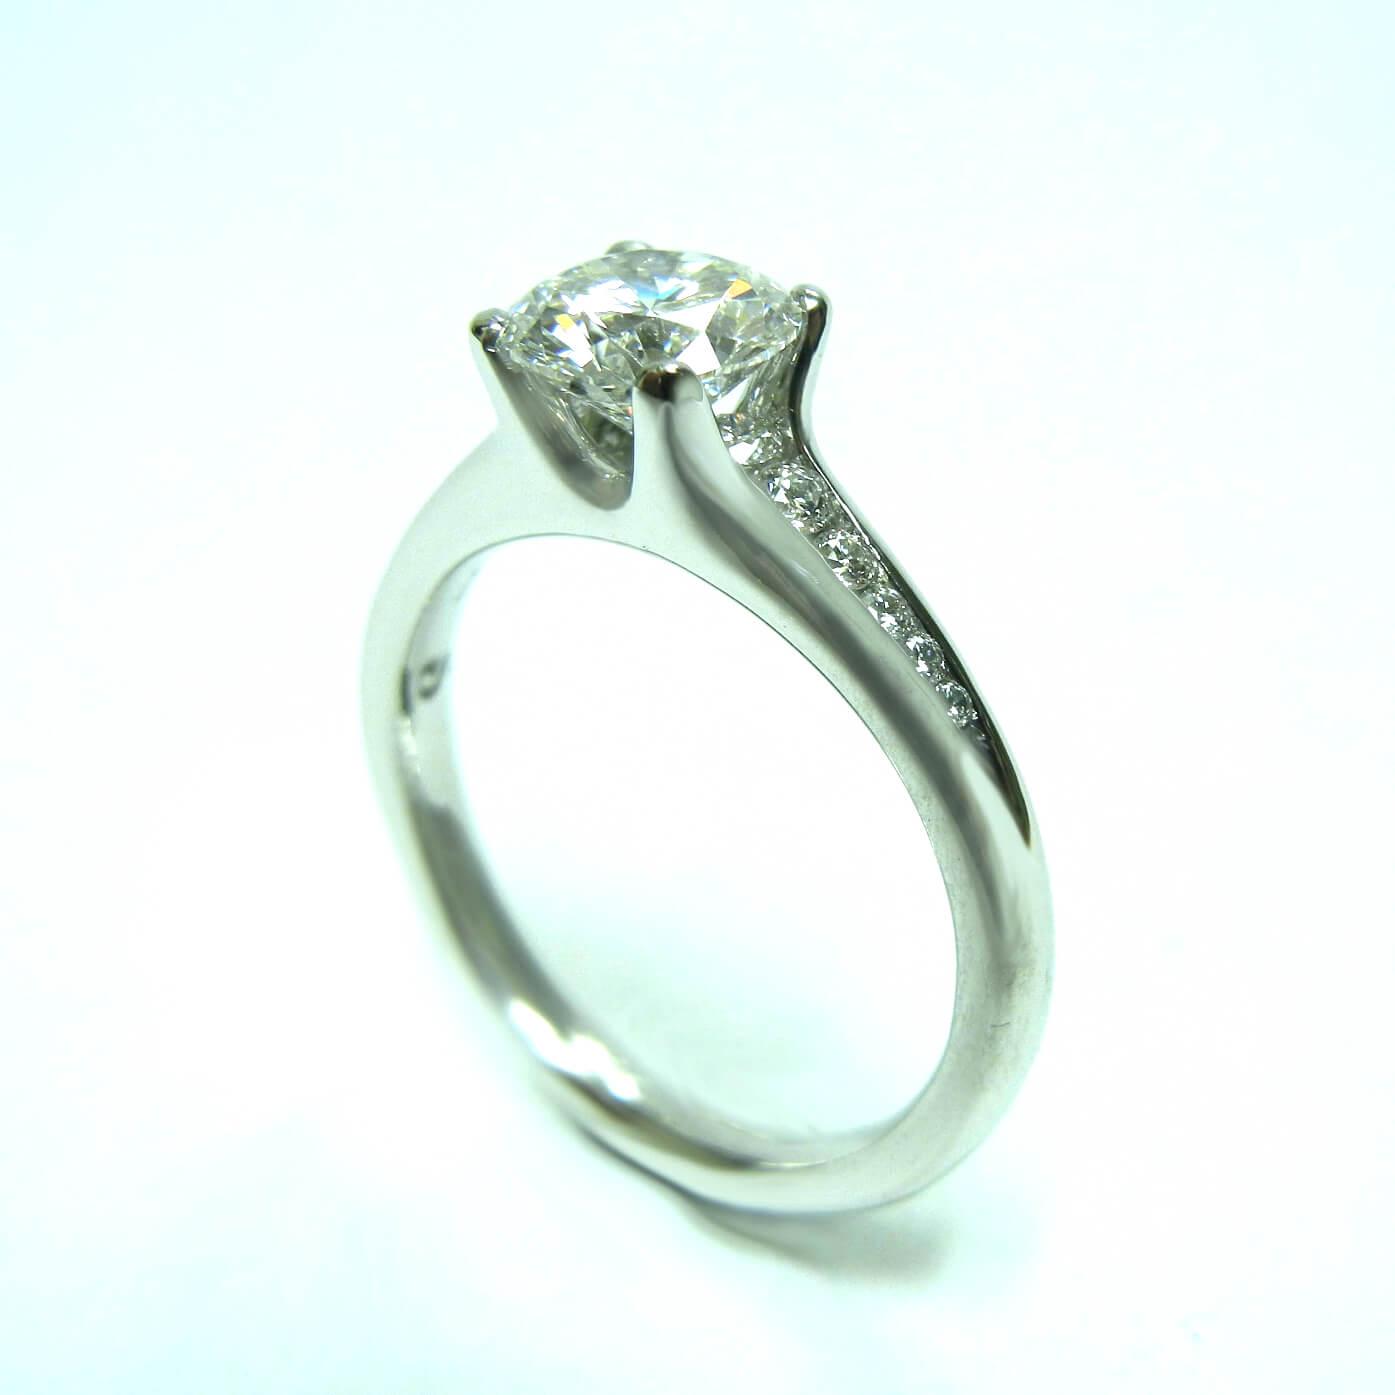 4 Prong platinum diamond engagement ring